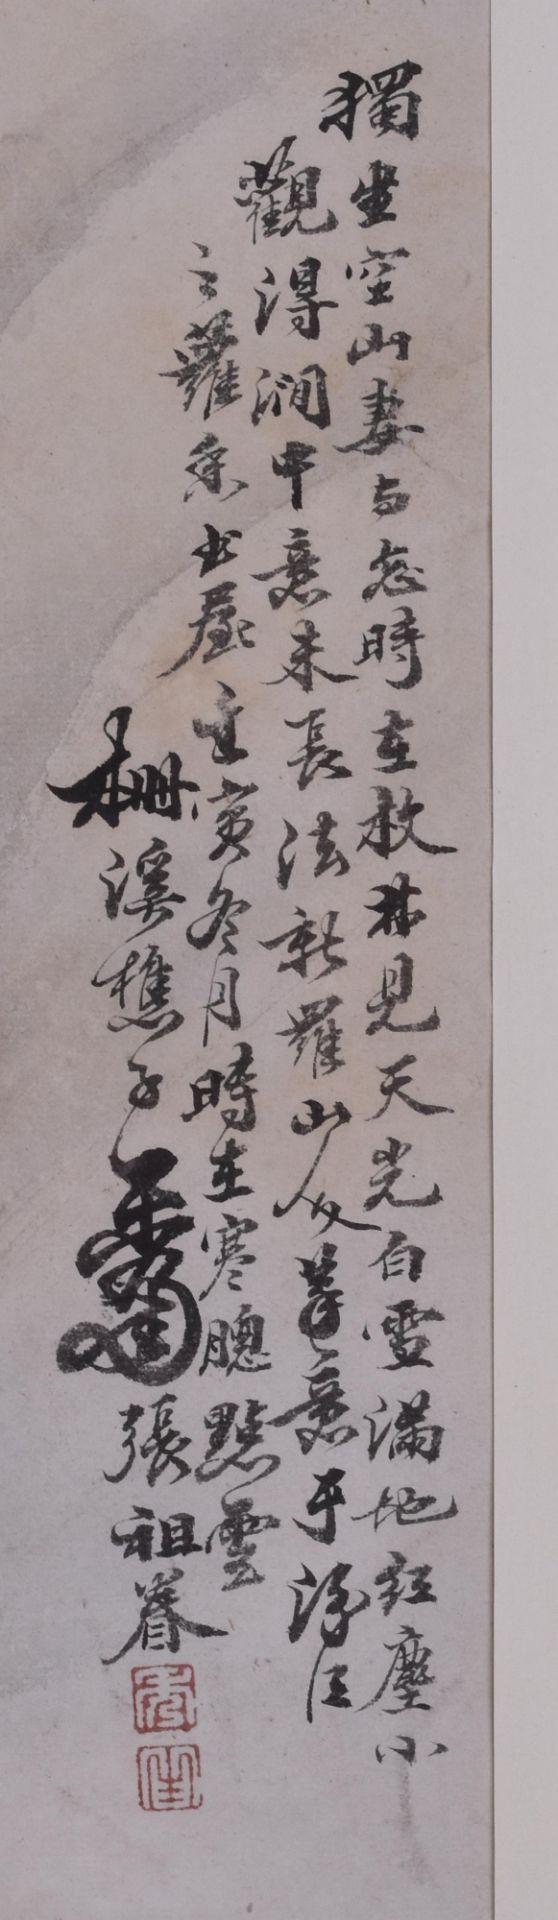 Zhang Zujiän Chinese artist of the 19th century - Image 5 of 6